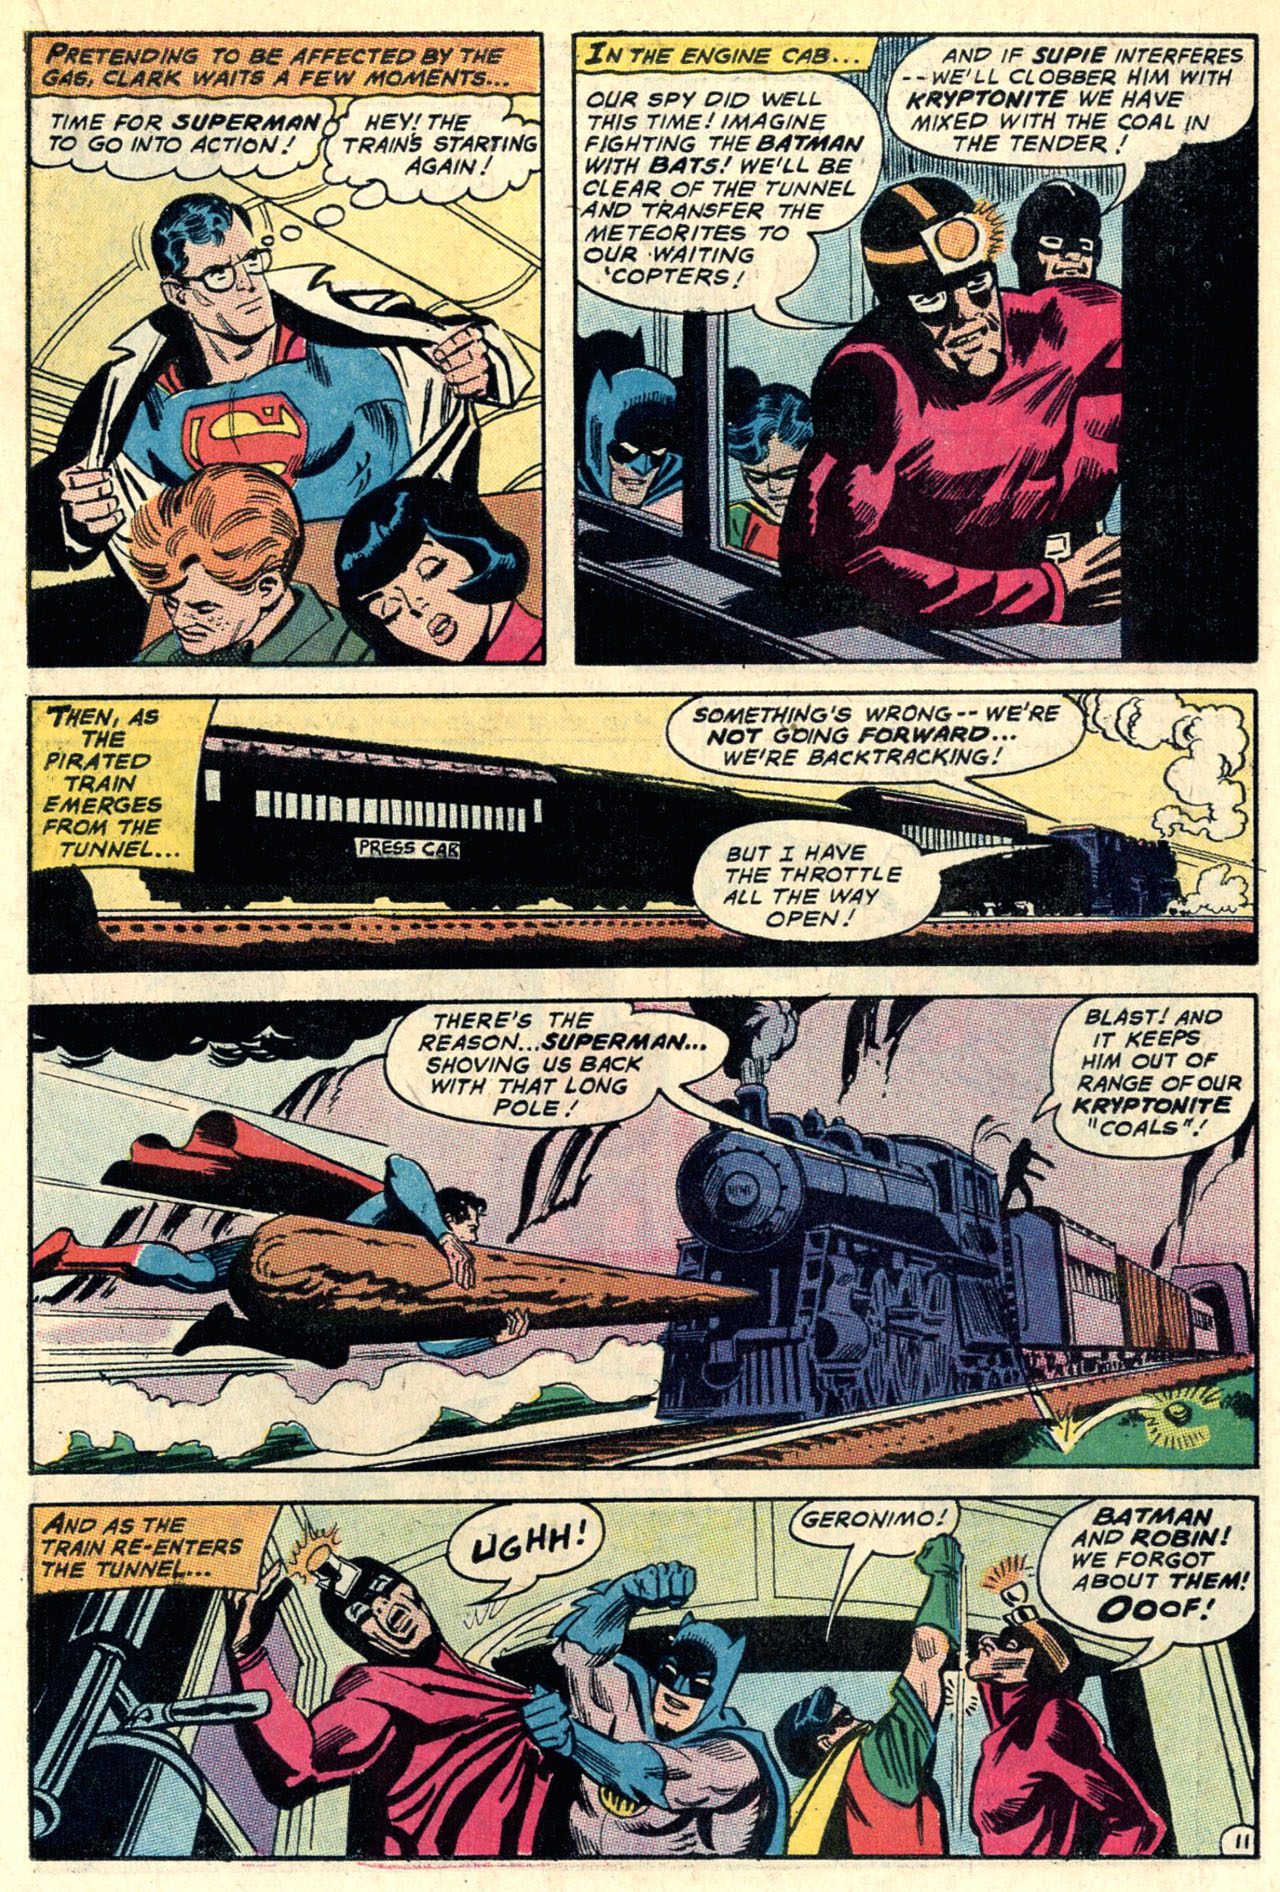 Read online World's Finest Comics comic -  Issue #196 - 15